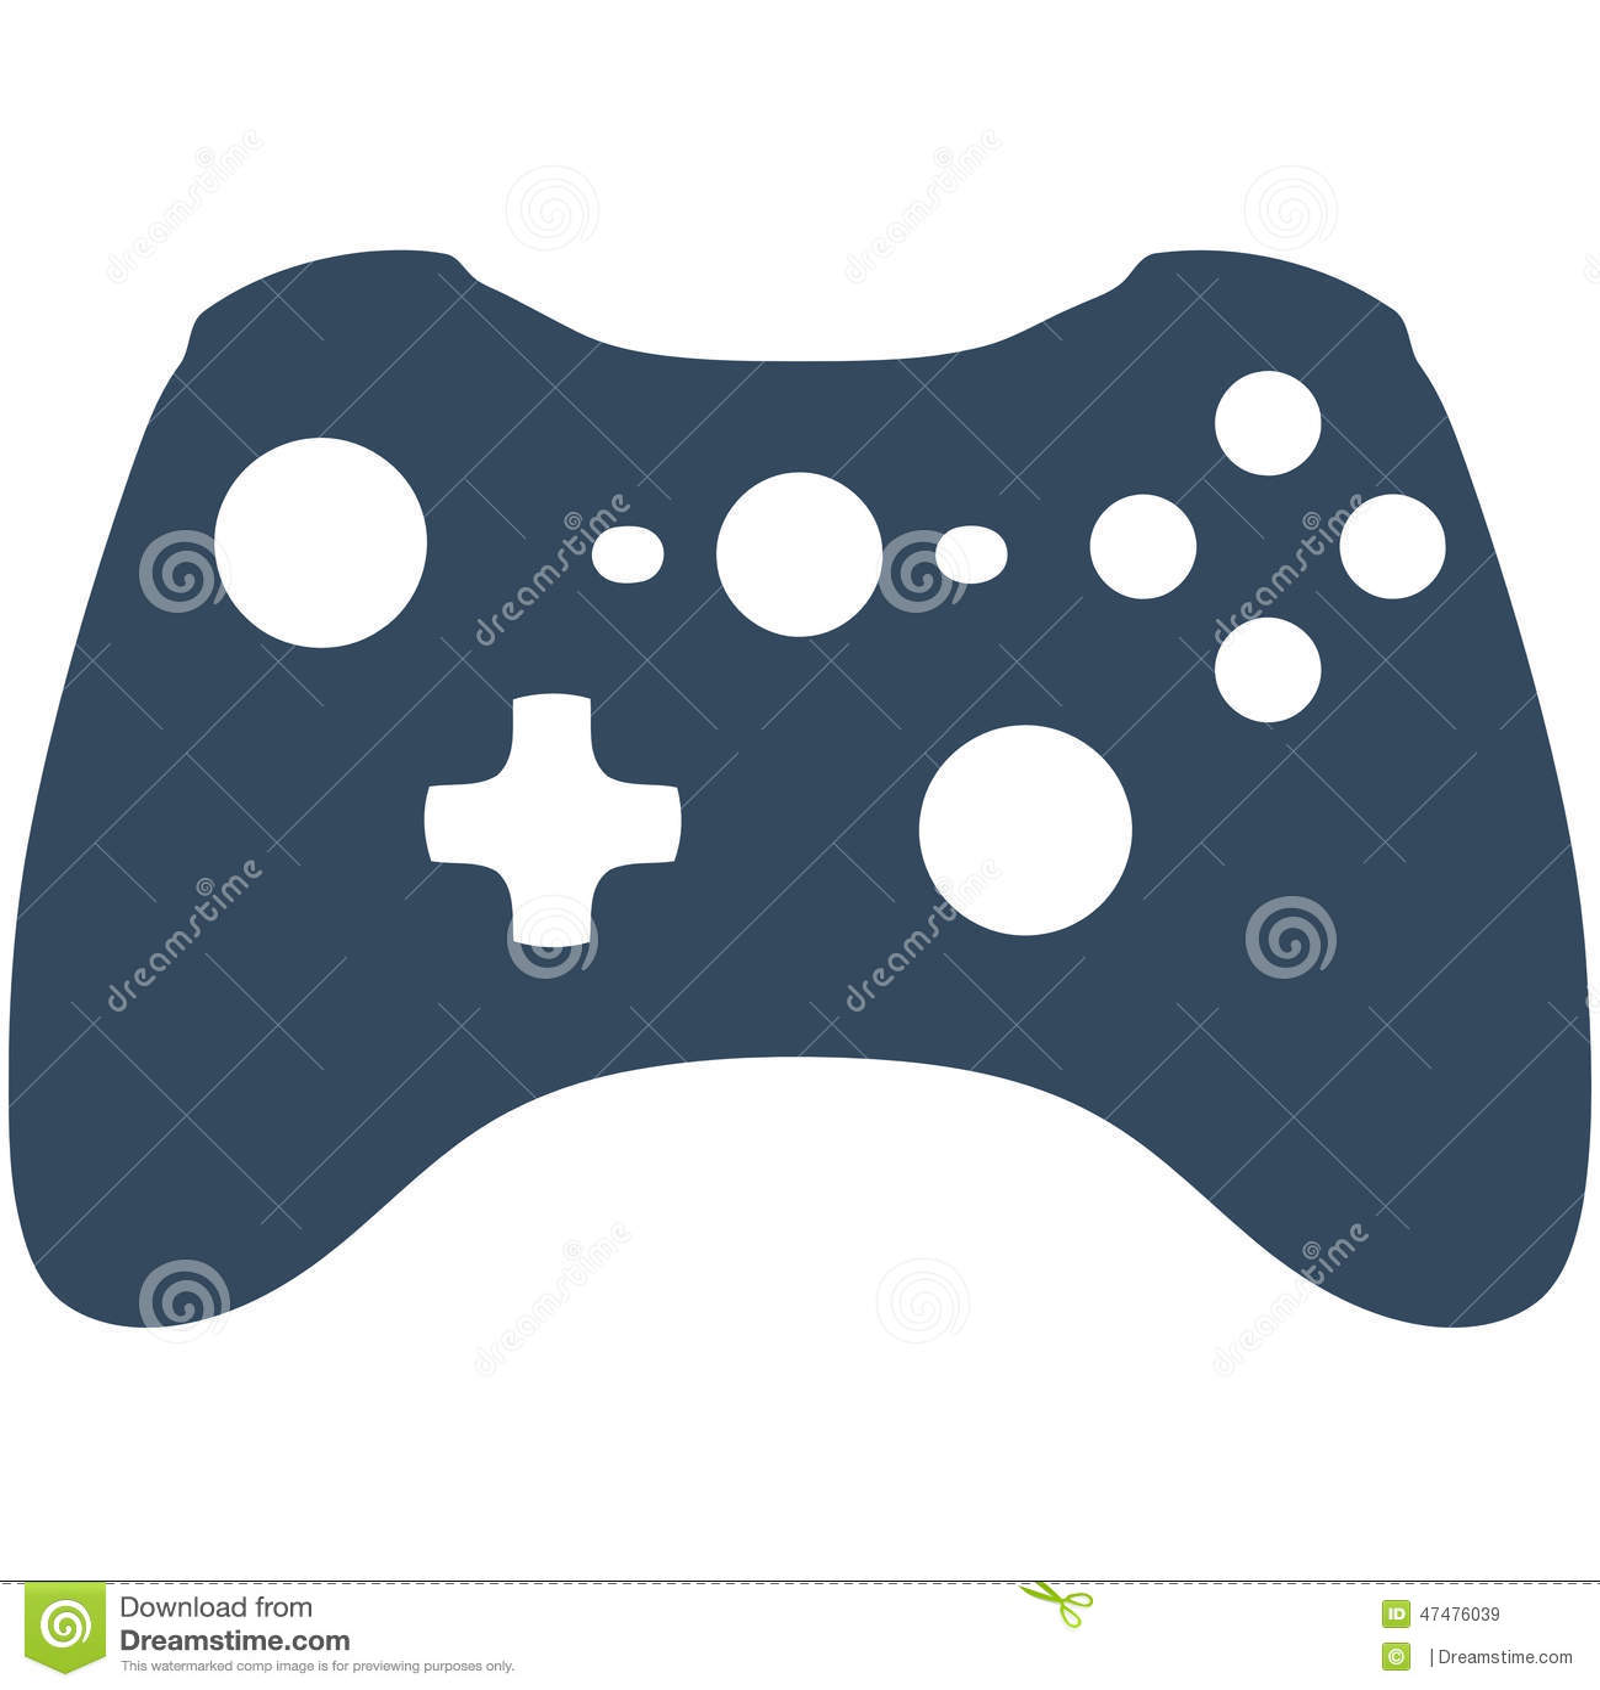 Xbox 360 Game Controller stock illustration. Illustration ...Xbox Controller Silhouette Image